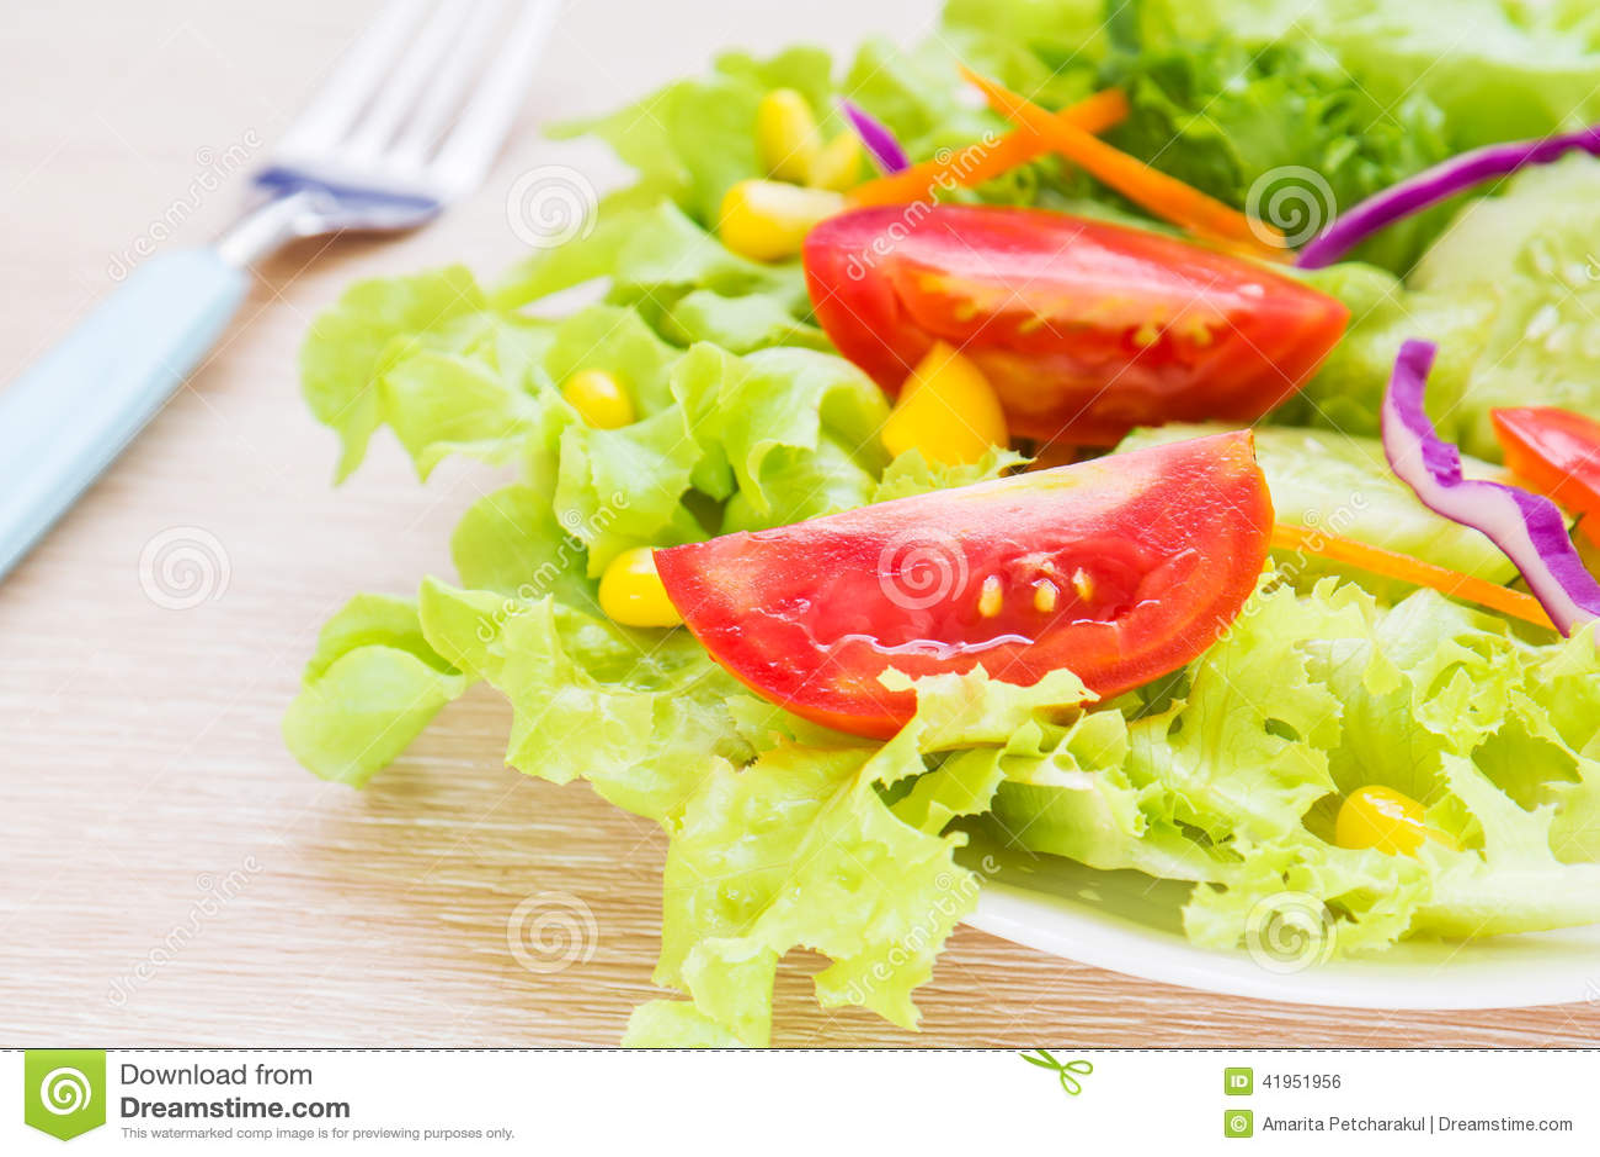 Warzywa sa?atkowi na talerzu